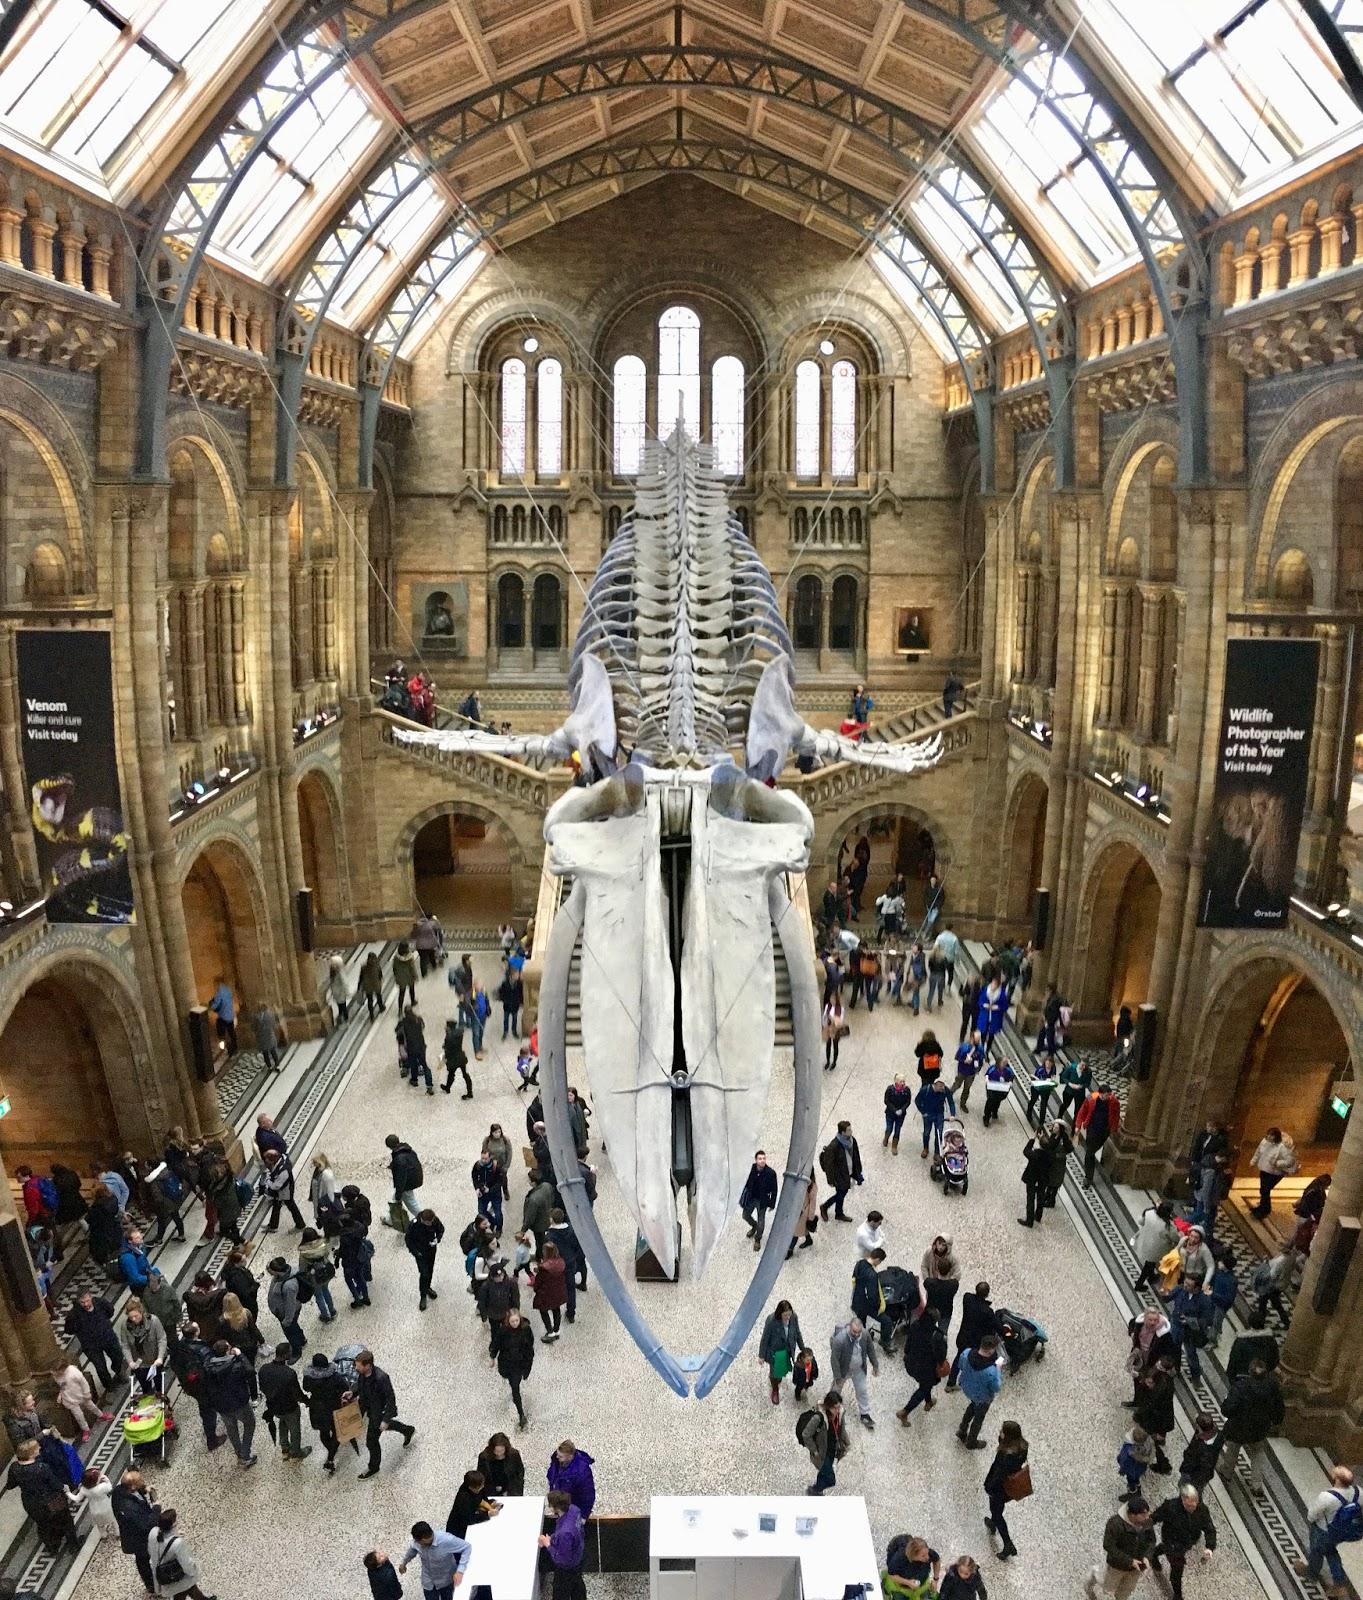 London Natural History Museum Naturkundemuseum Eingangshalle